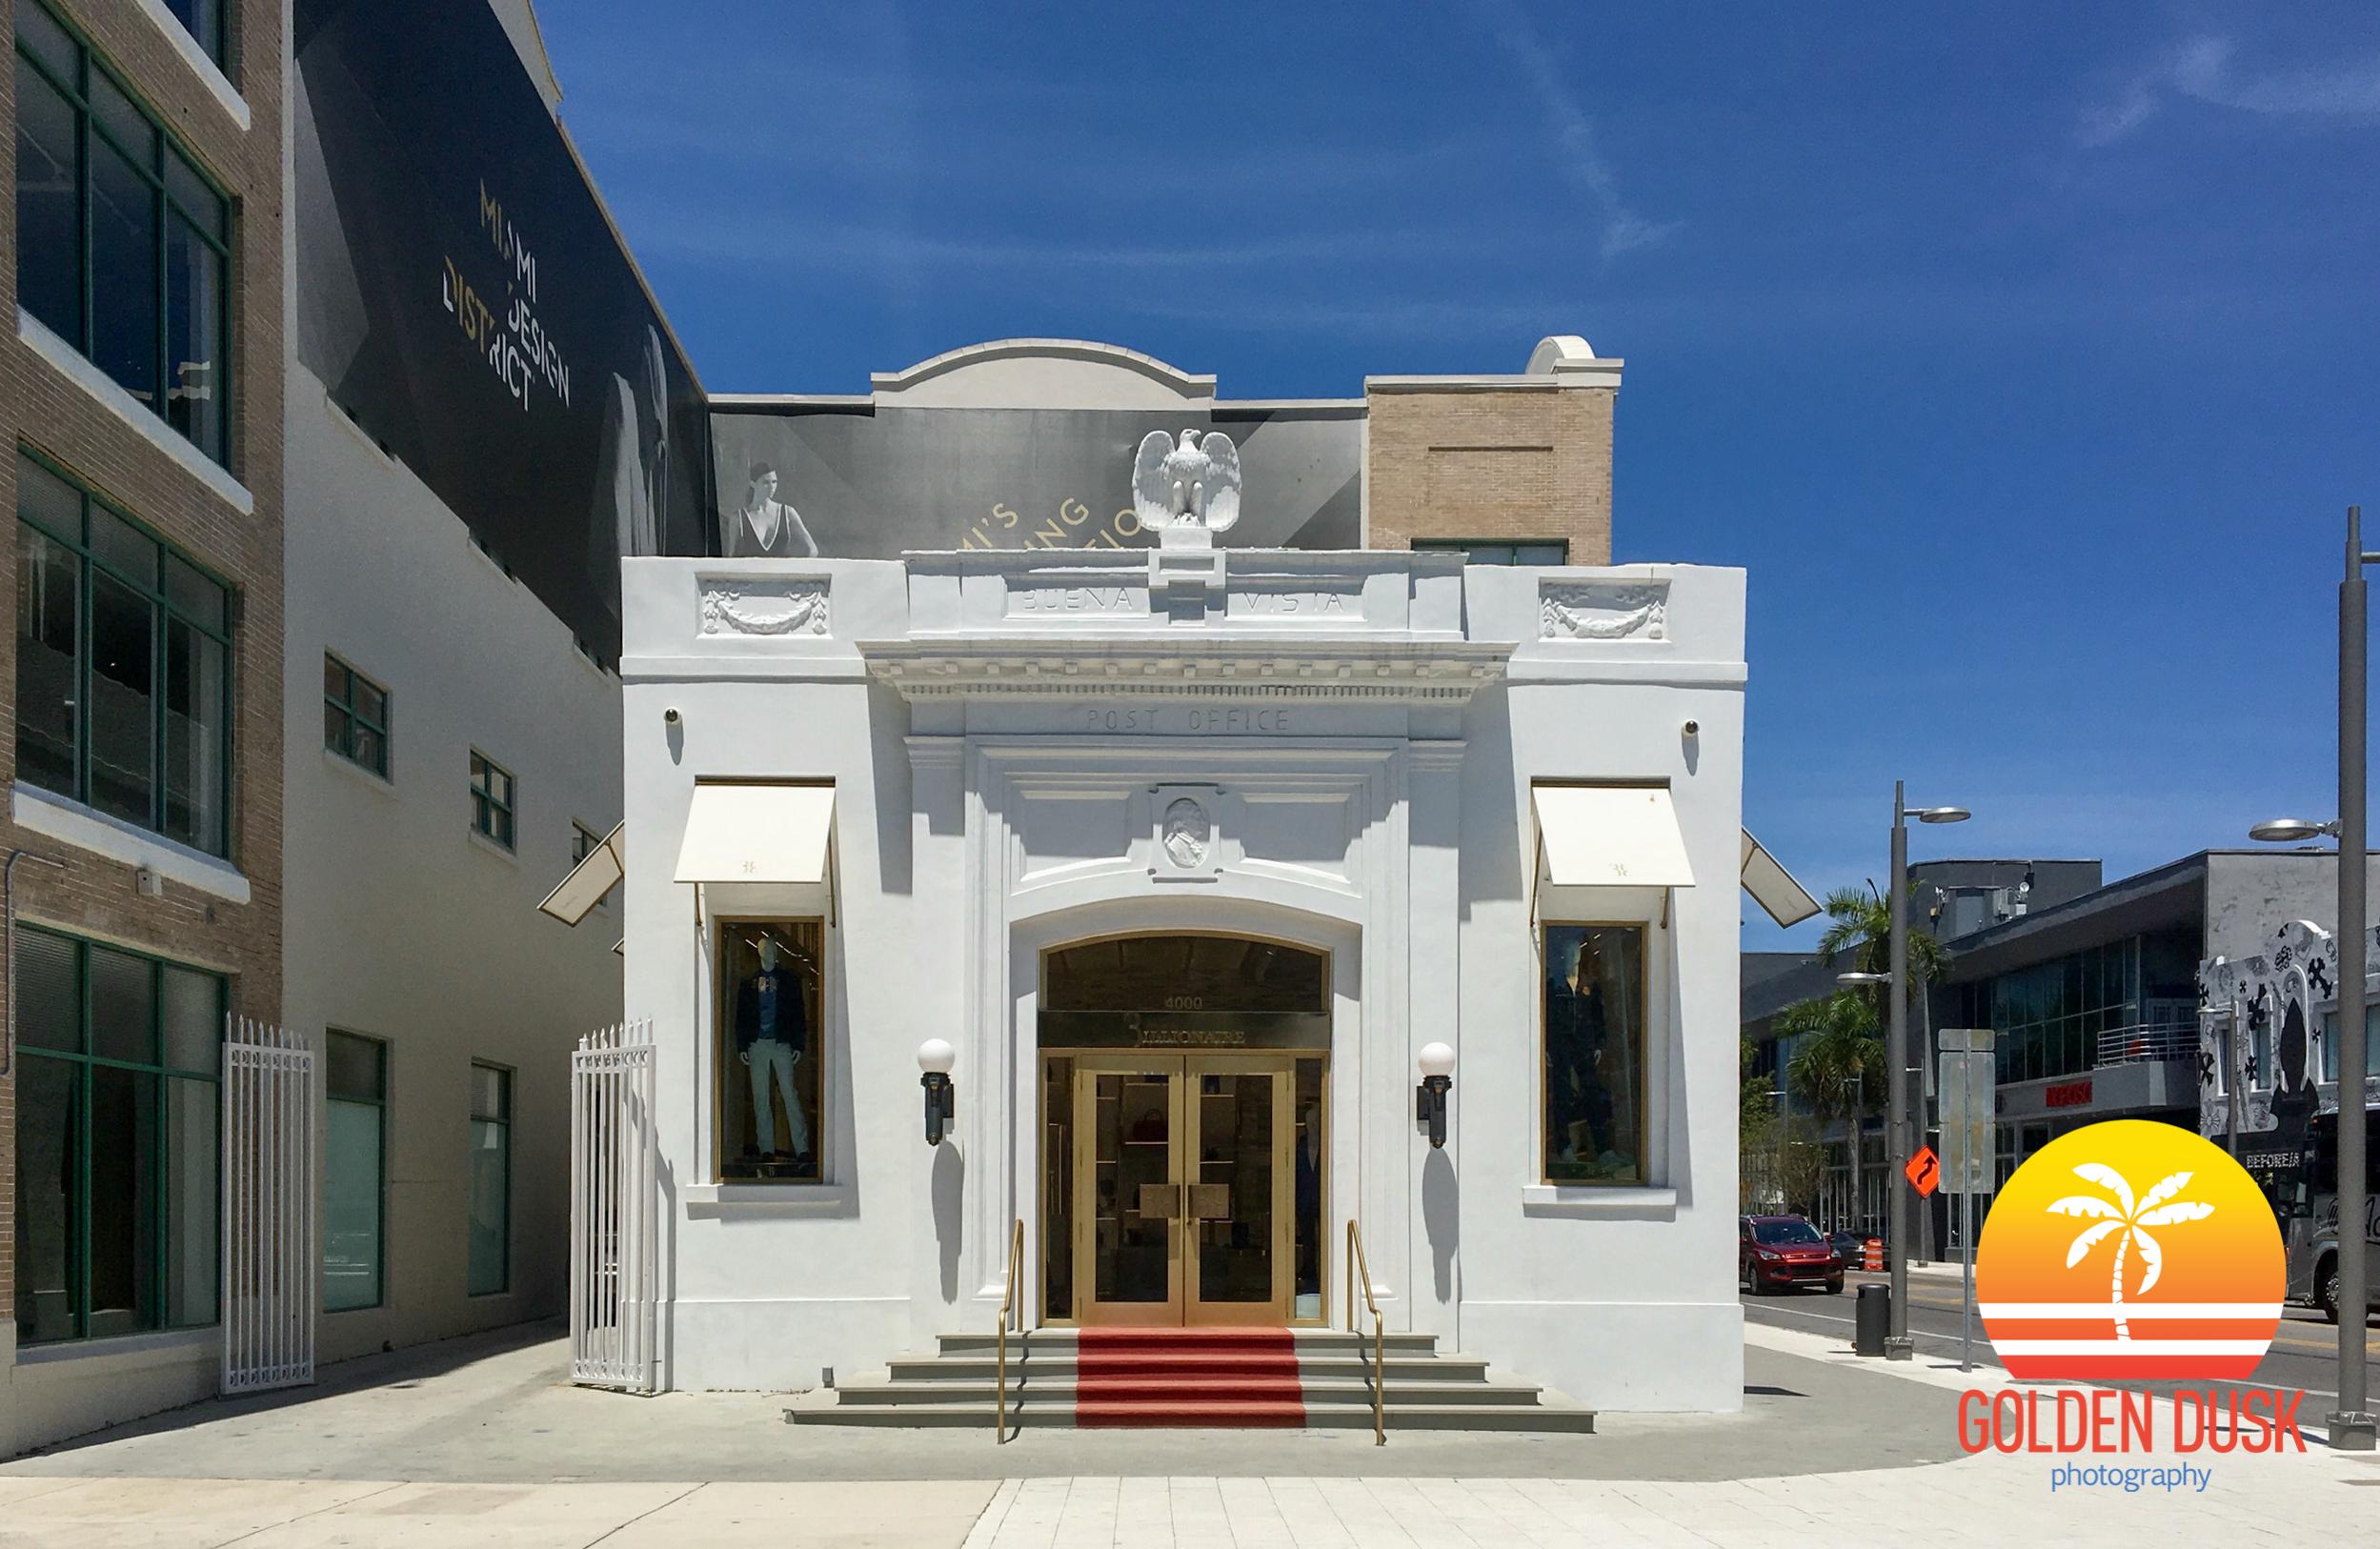 Buena Vista Post Office in Design District